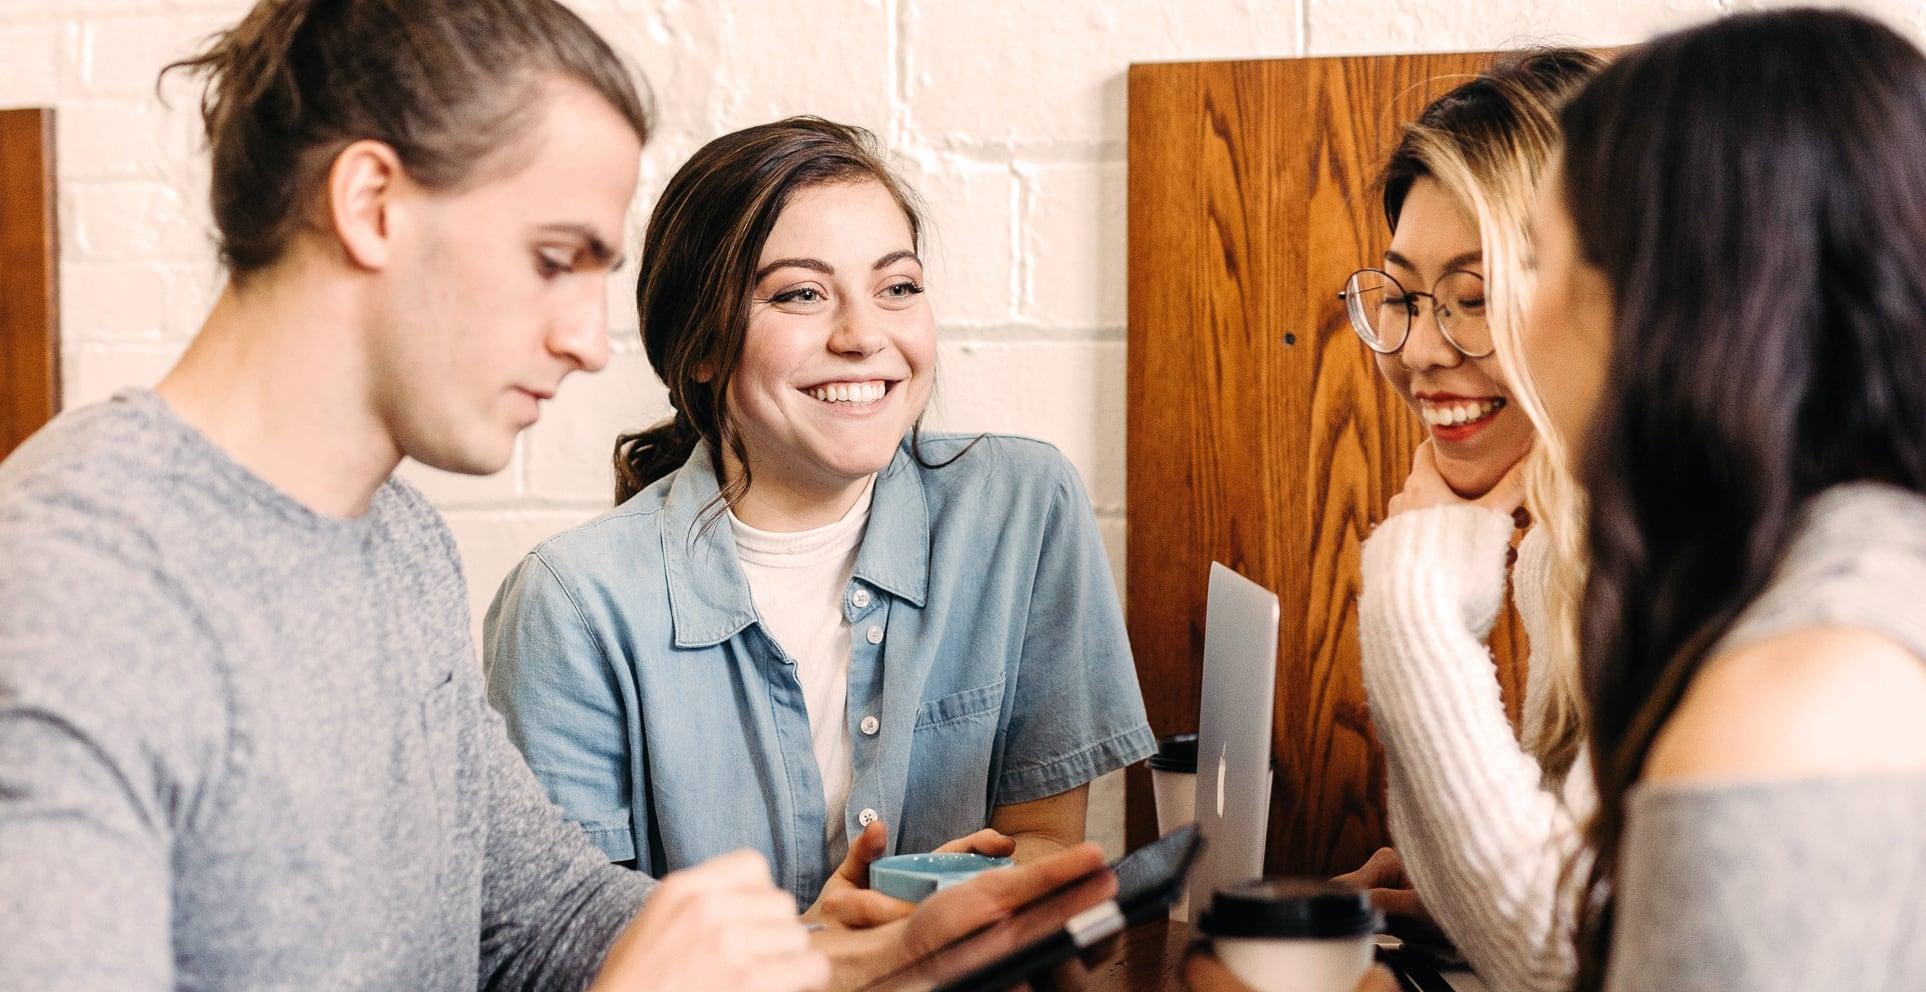 INSCALE - Work Environment - Build a team